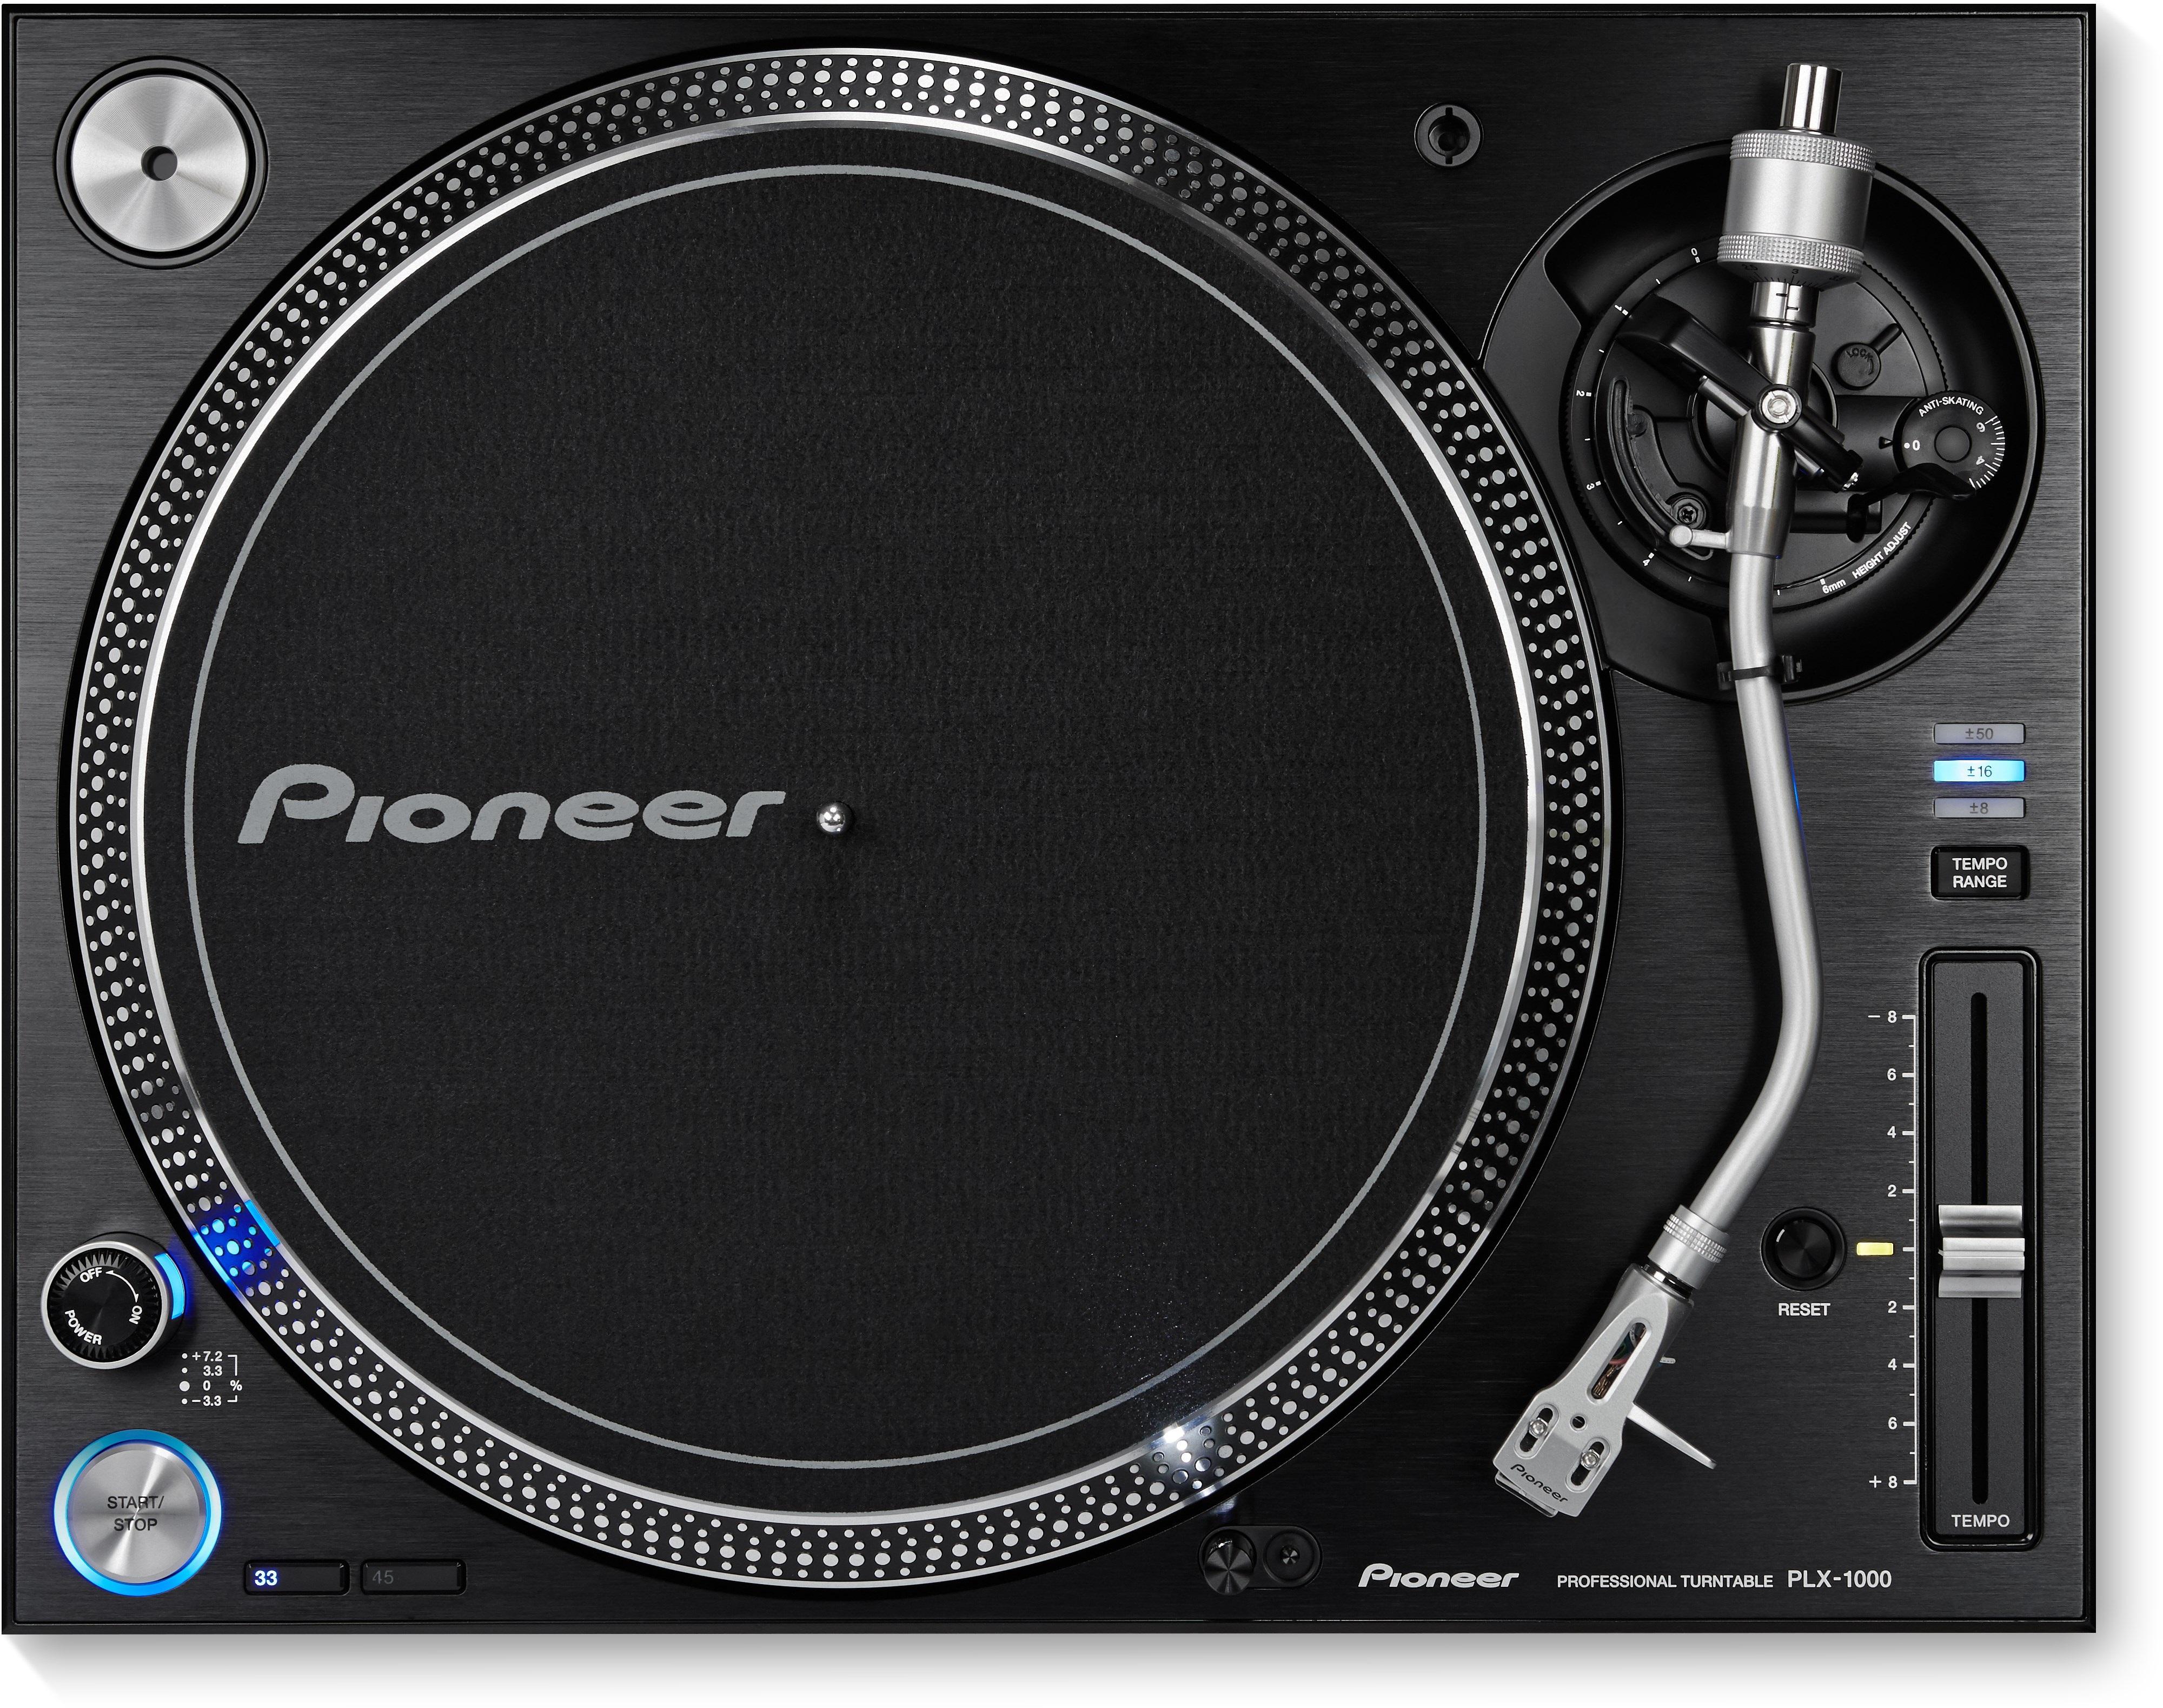 Pioneer DJ PLX-1000